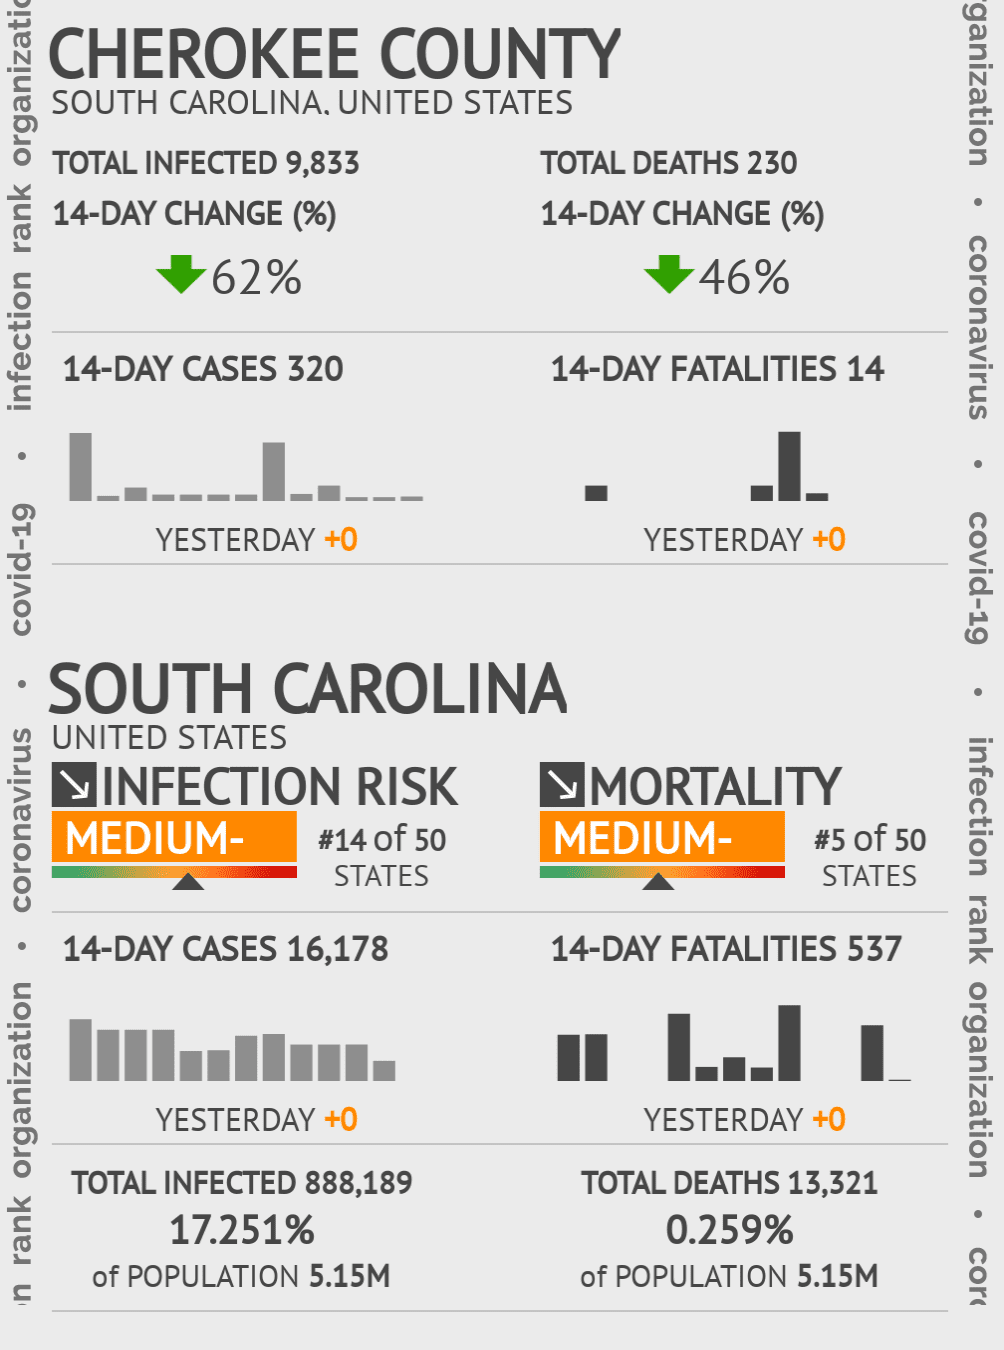 Cherokee County Coronavirus Covid-19 Risk of Infection on July 24, 2021